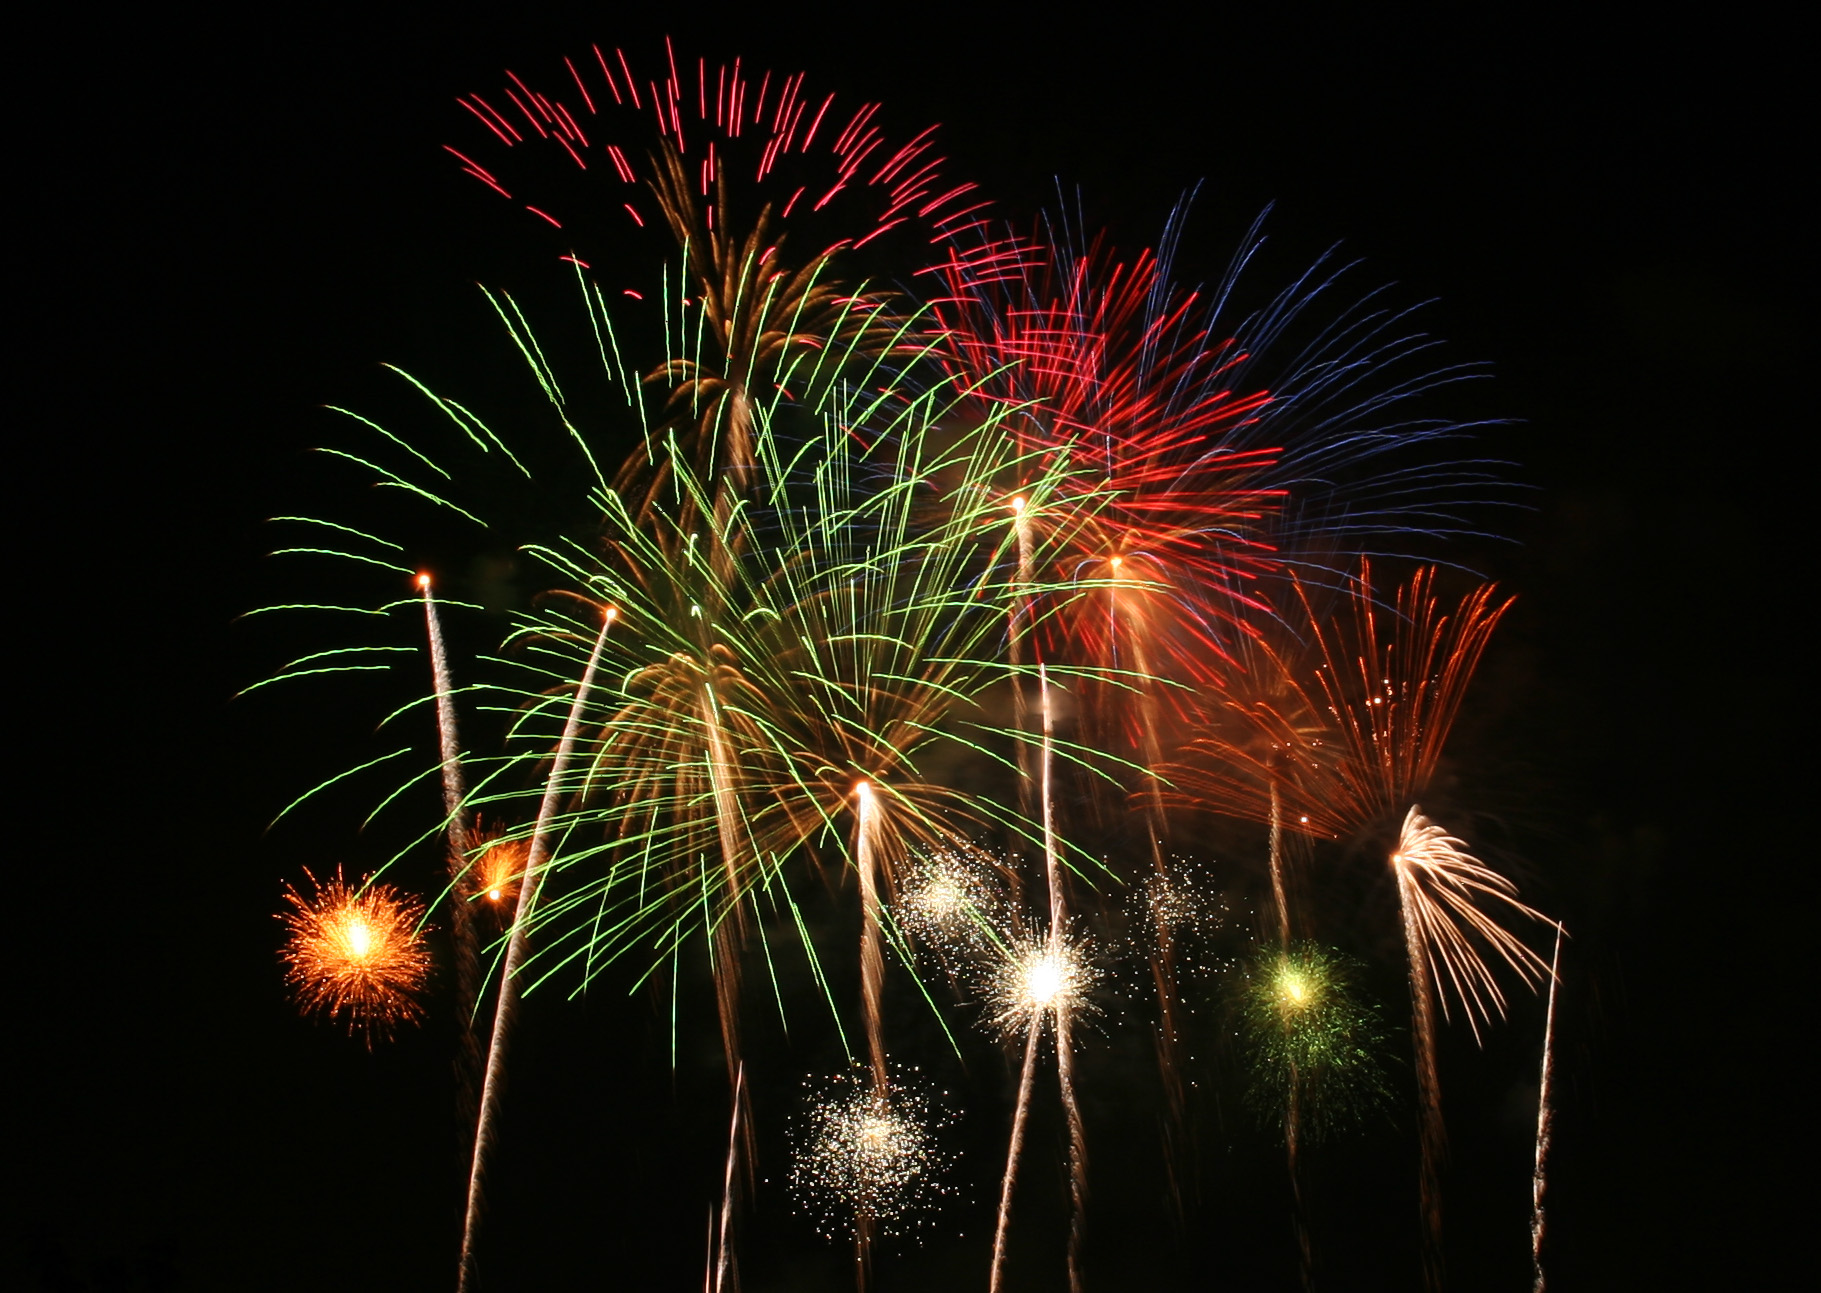 Fireworks:  Delayed Explosion Injures A Dozen Spectators